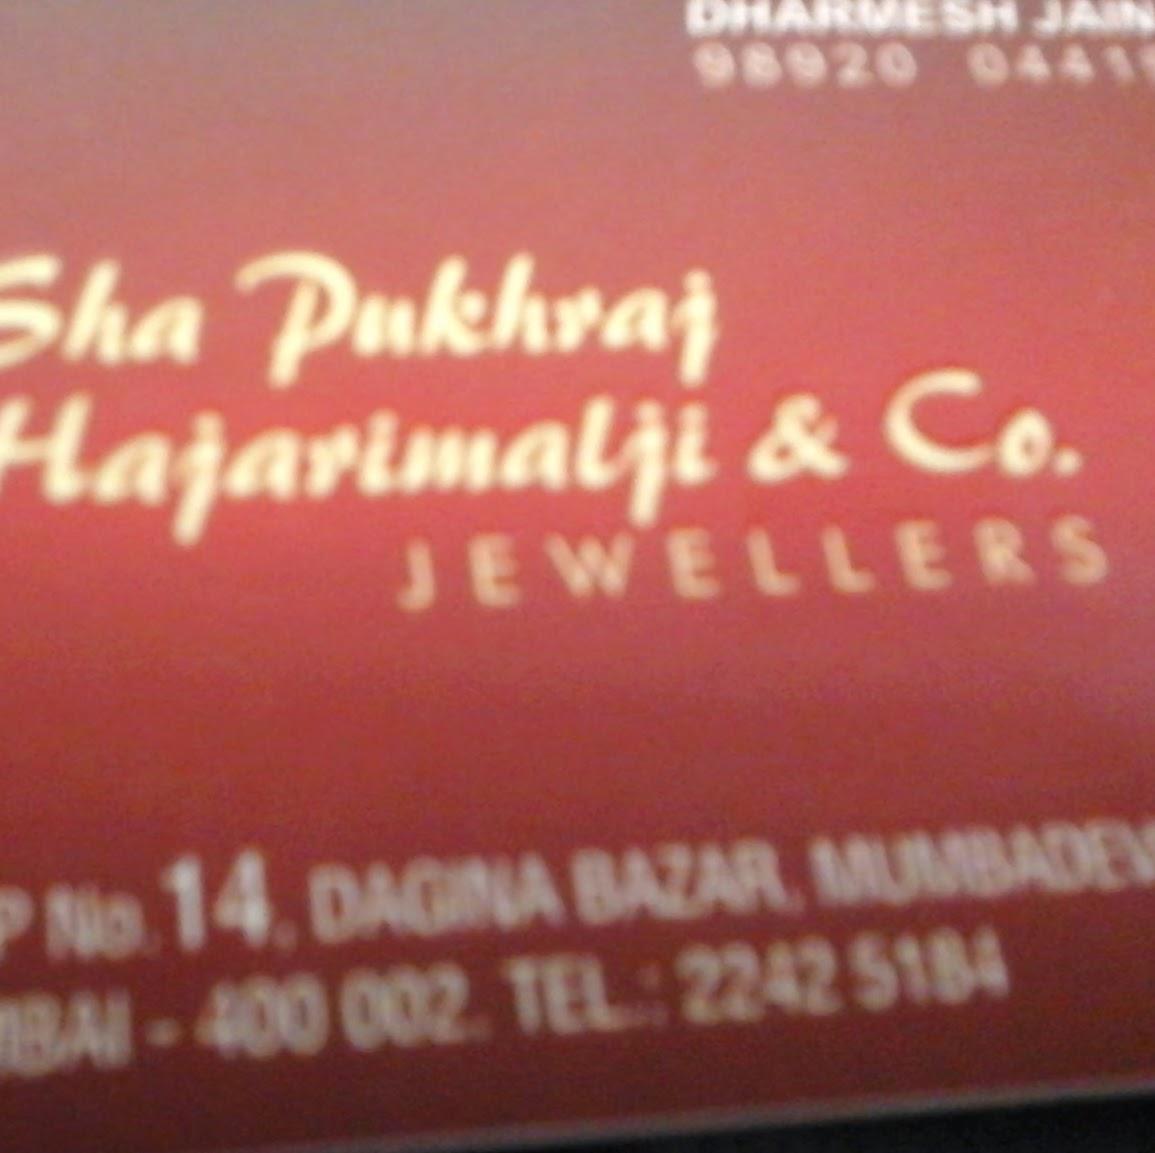 SHA PUKHRAJ HAJARIMALJI AND COMPANY